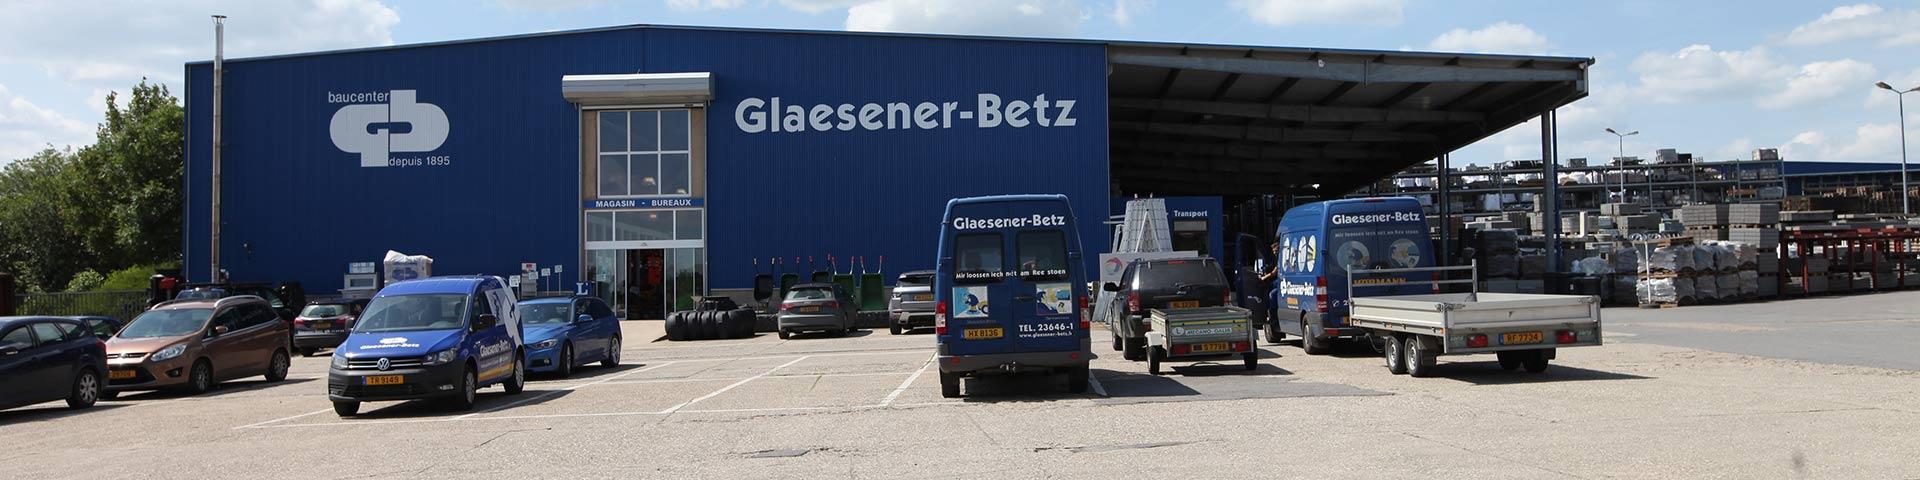 Glaesener-Betz Op Riner